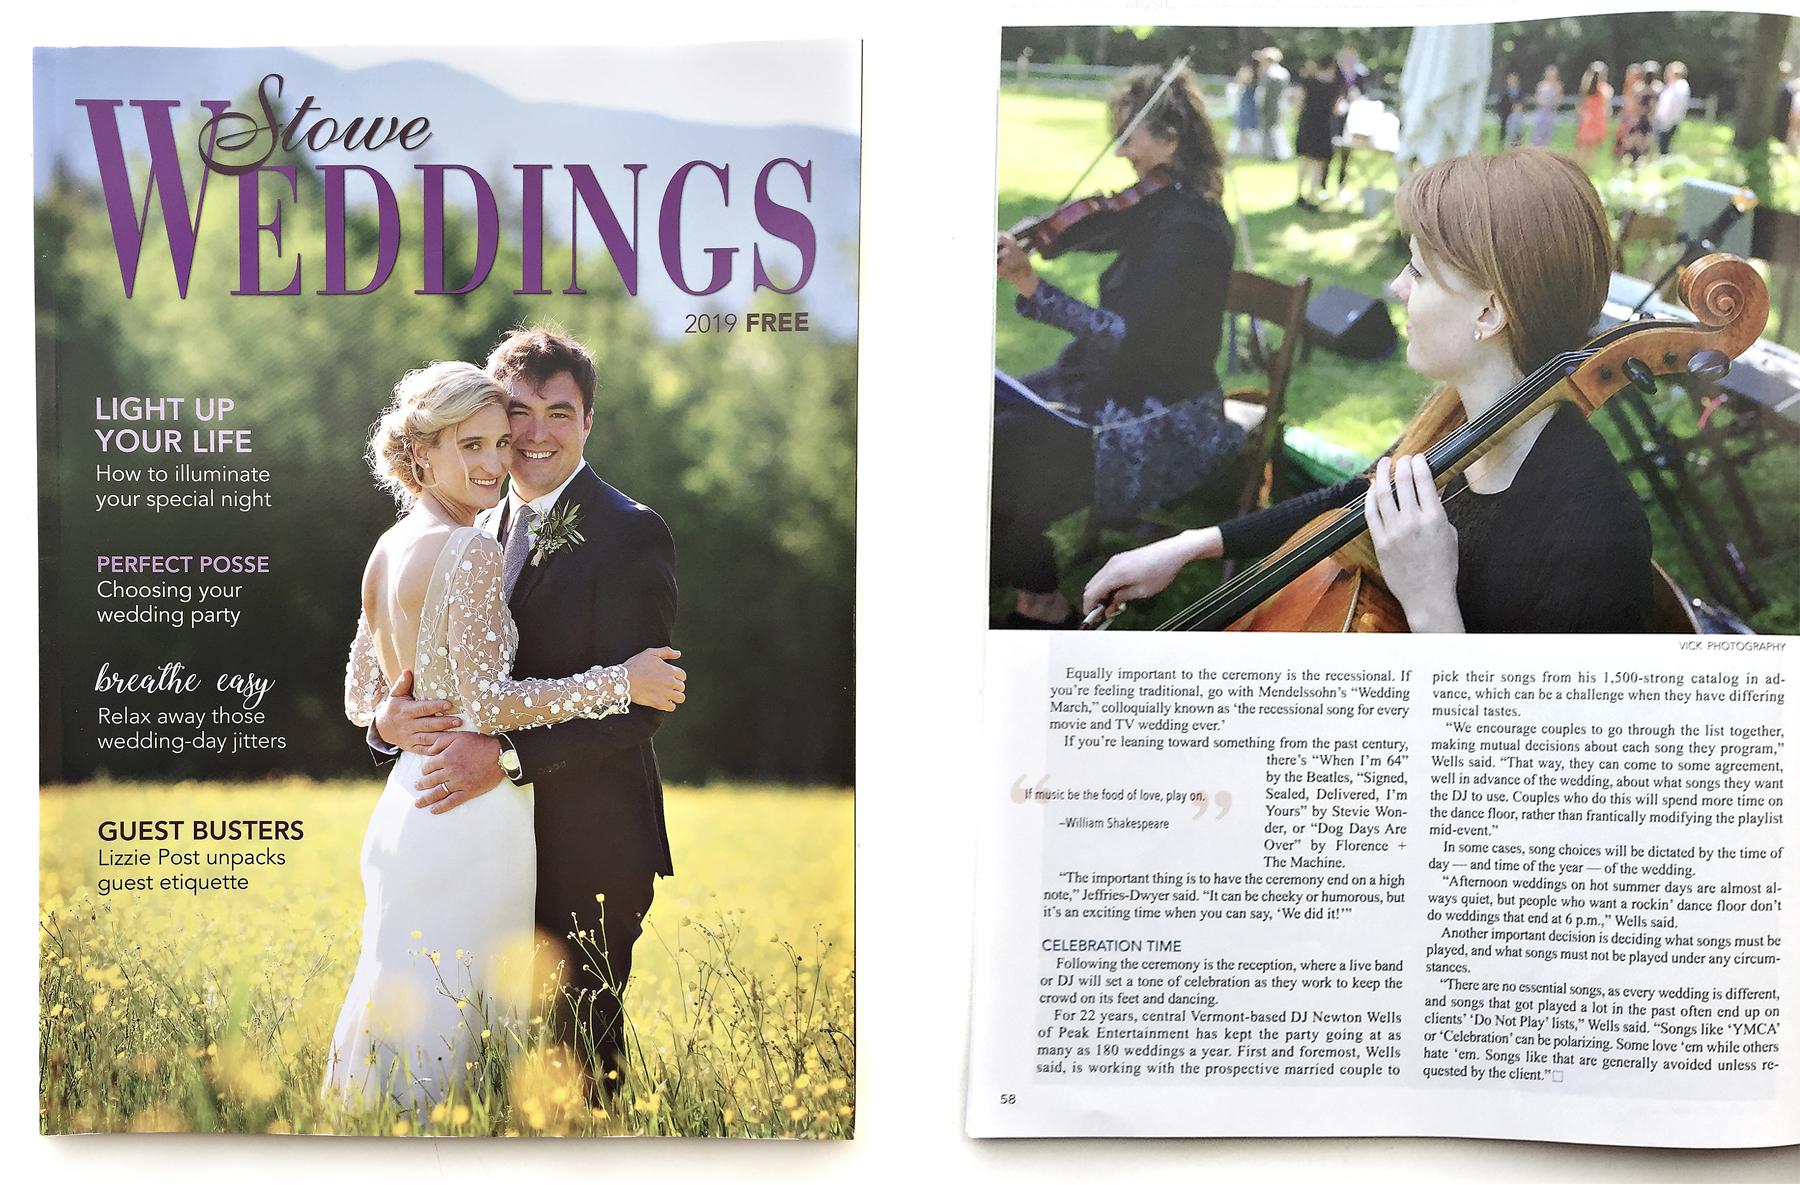 01 Vick Photography Feature Stowe Wedding Magazine 2019.jpg